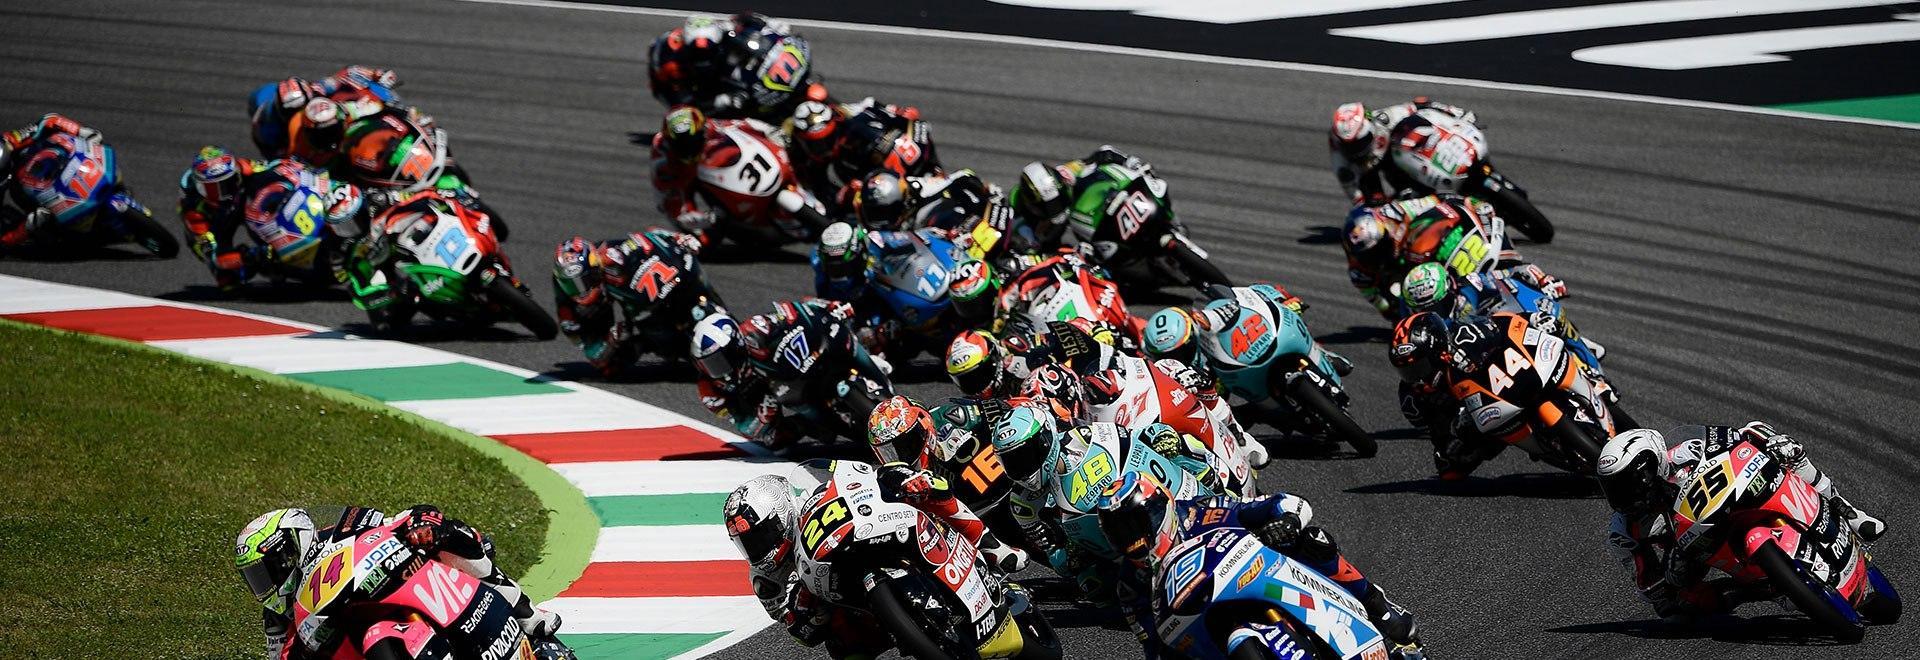 PreMoto3 Vallelunga. Race 1